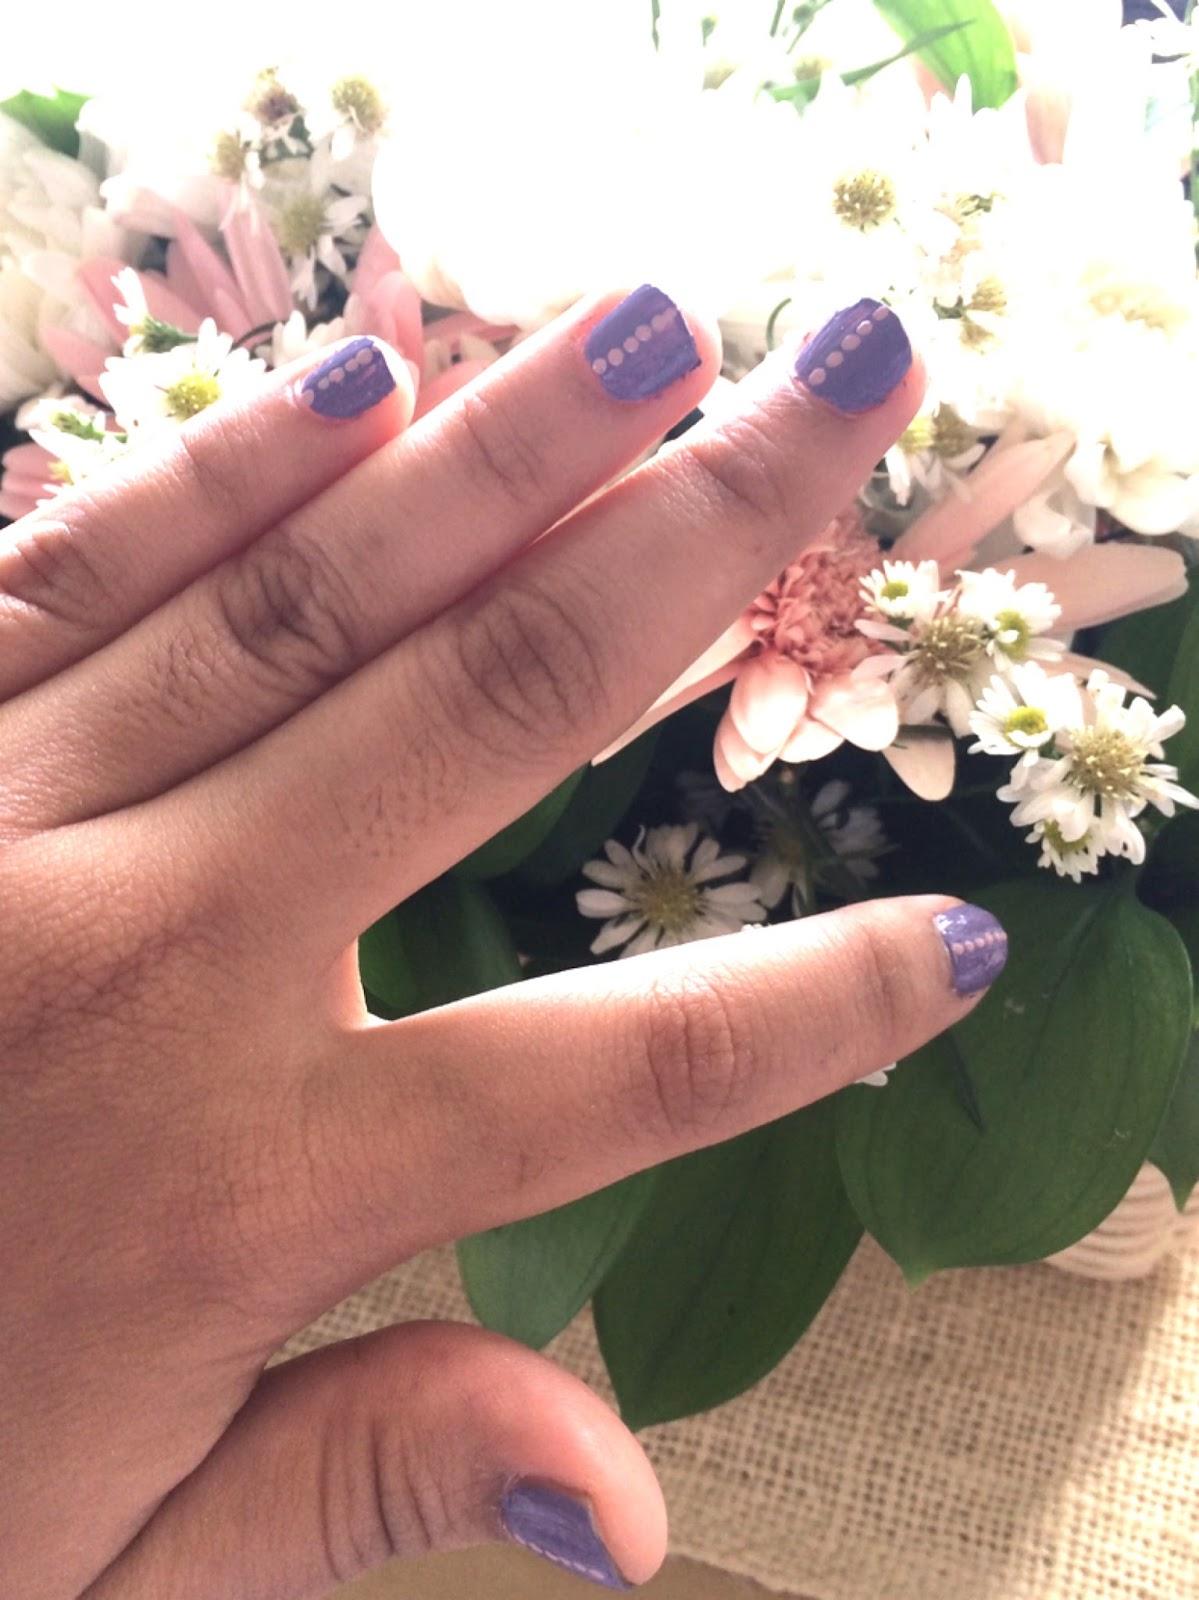 f2f nail polish